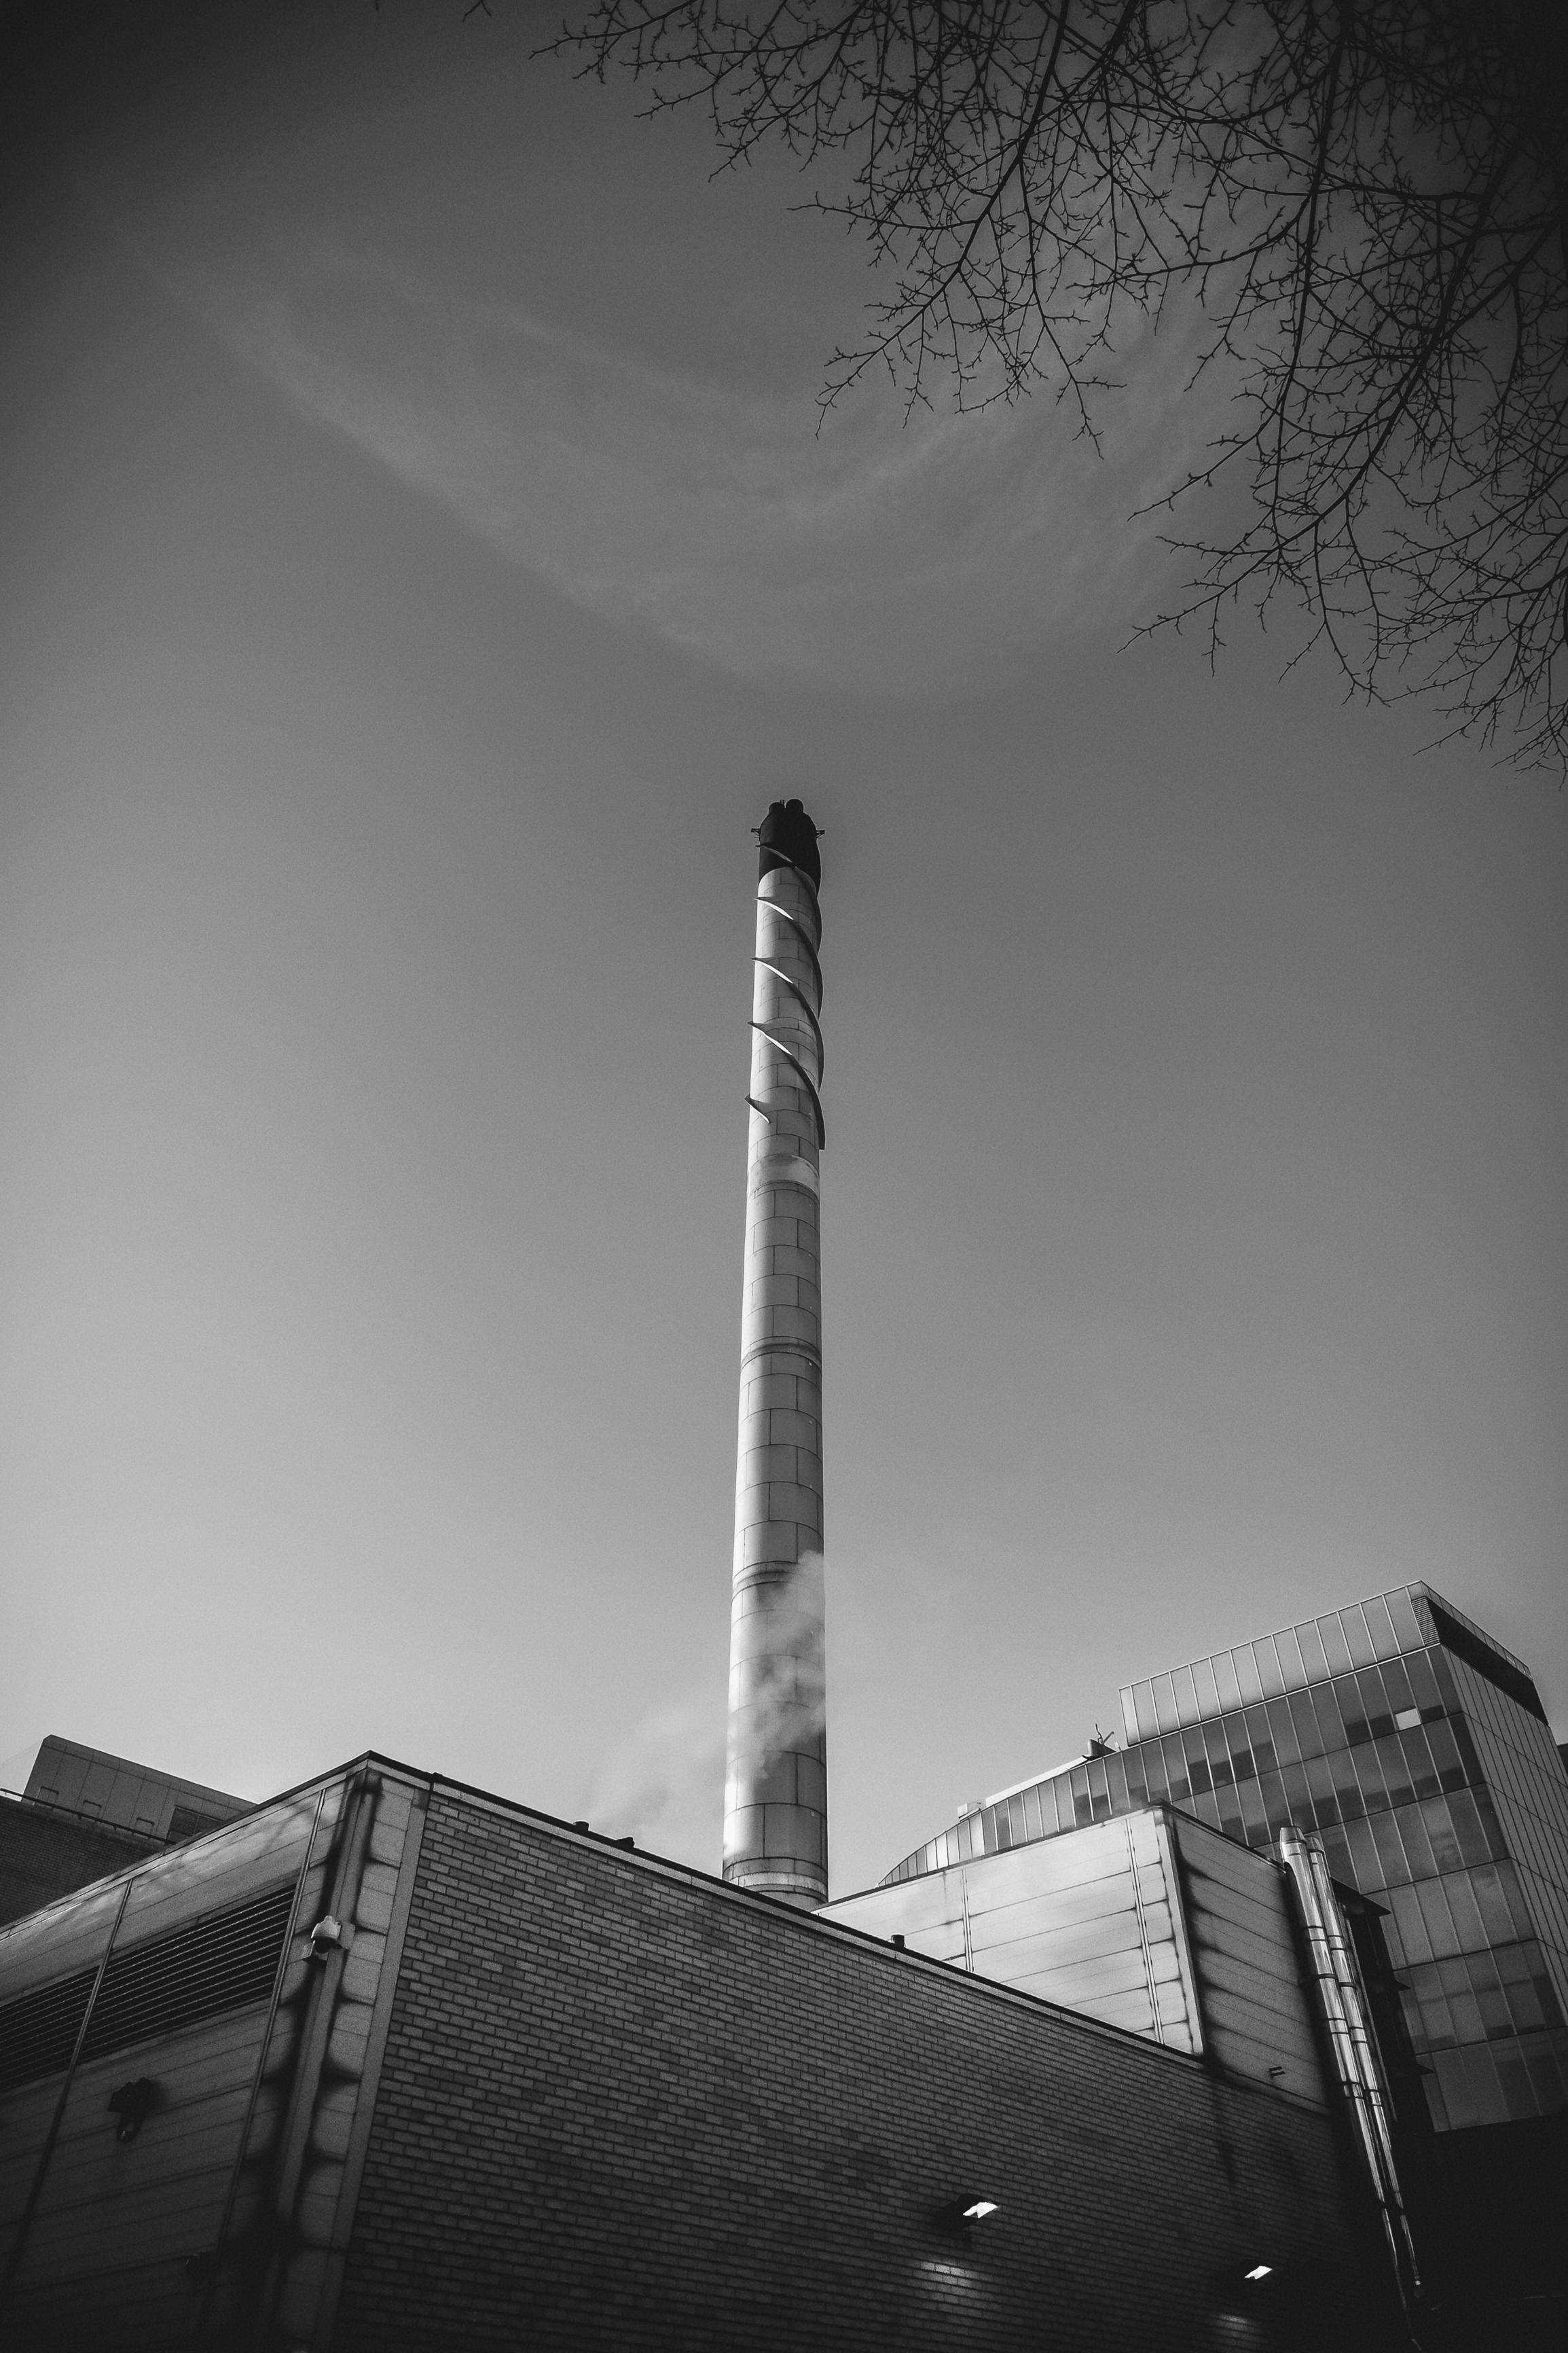 London Fuji Photowalk | Fuji XE2 | 14mm - F2.8 - 1/4000th - iso800